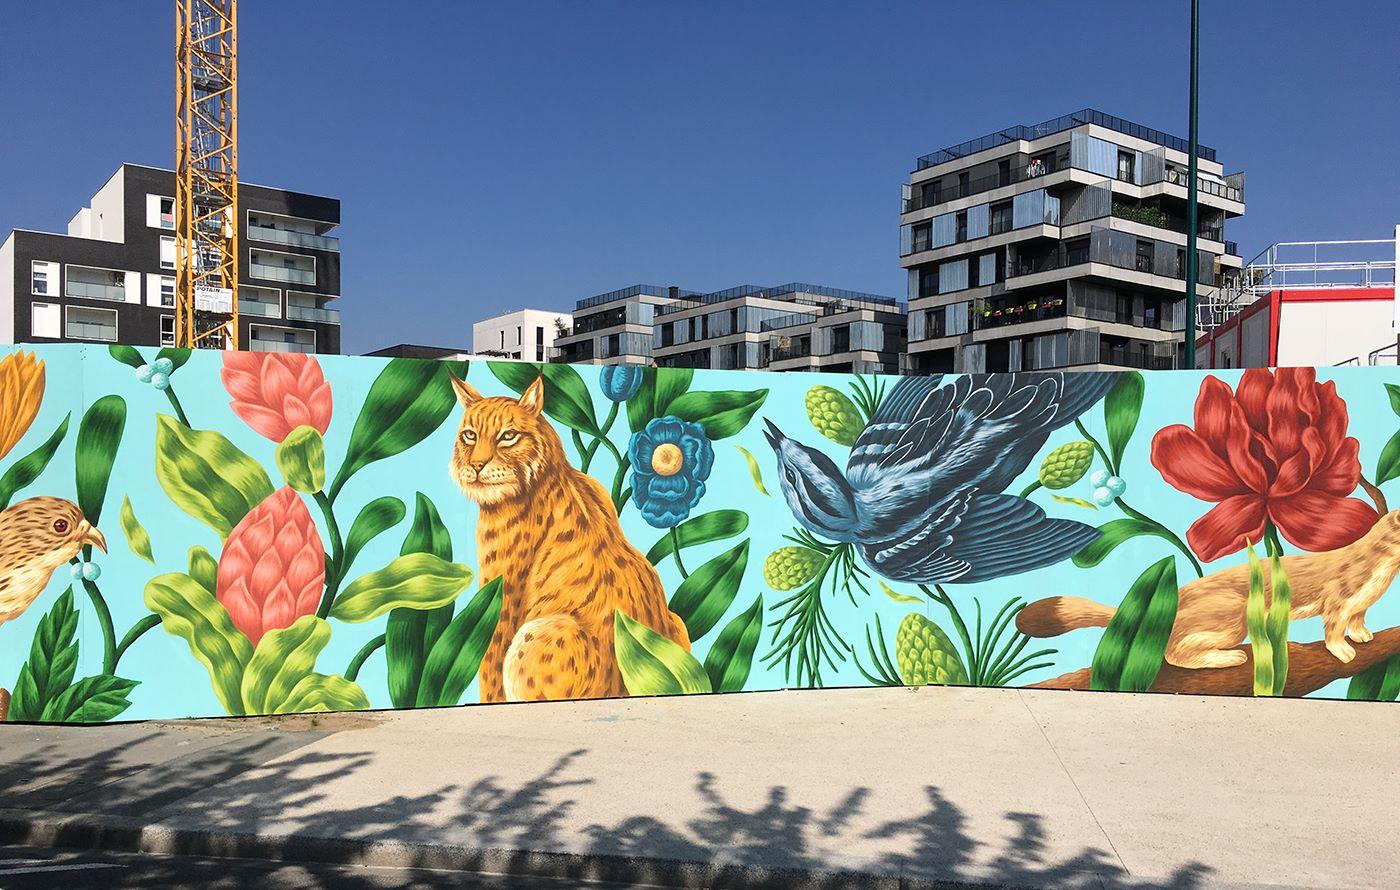 arturbain murales quai 36 Saddo 7 - Quai 36 invite des street artistes à colorer halls de gare et palissades de chantiers